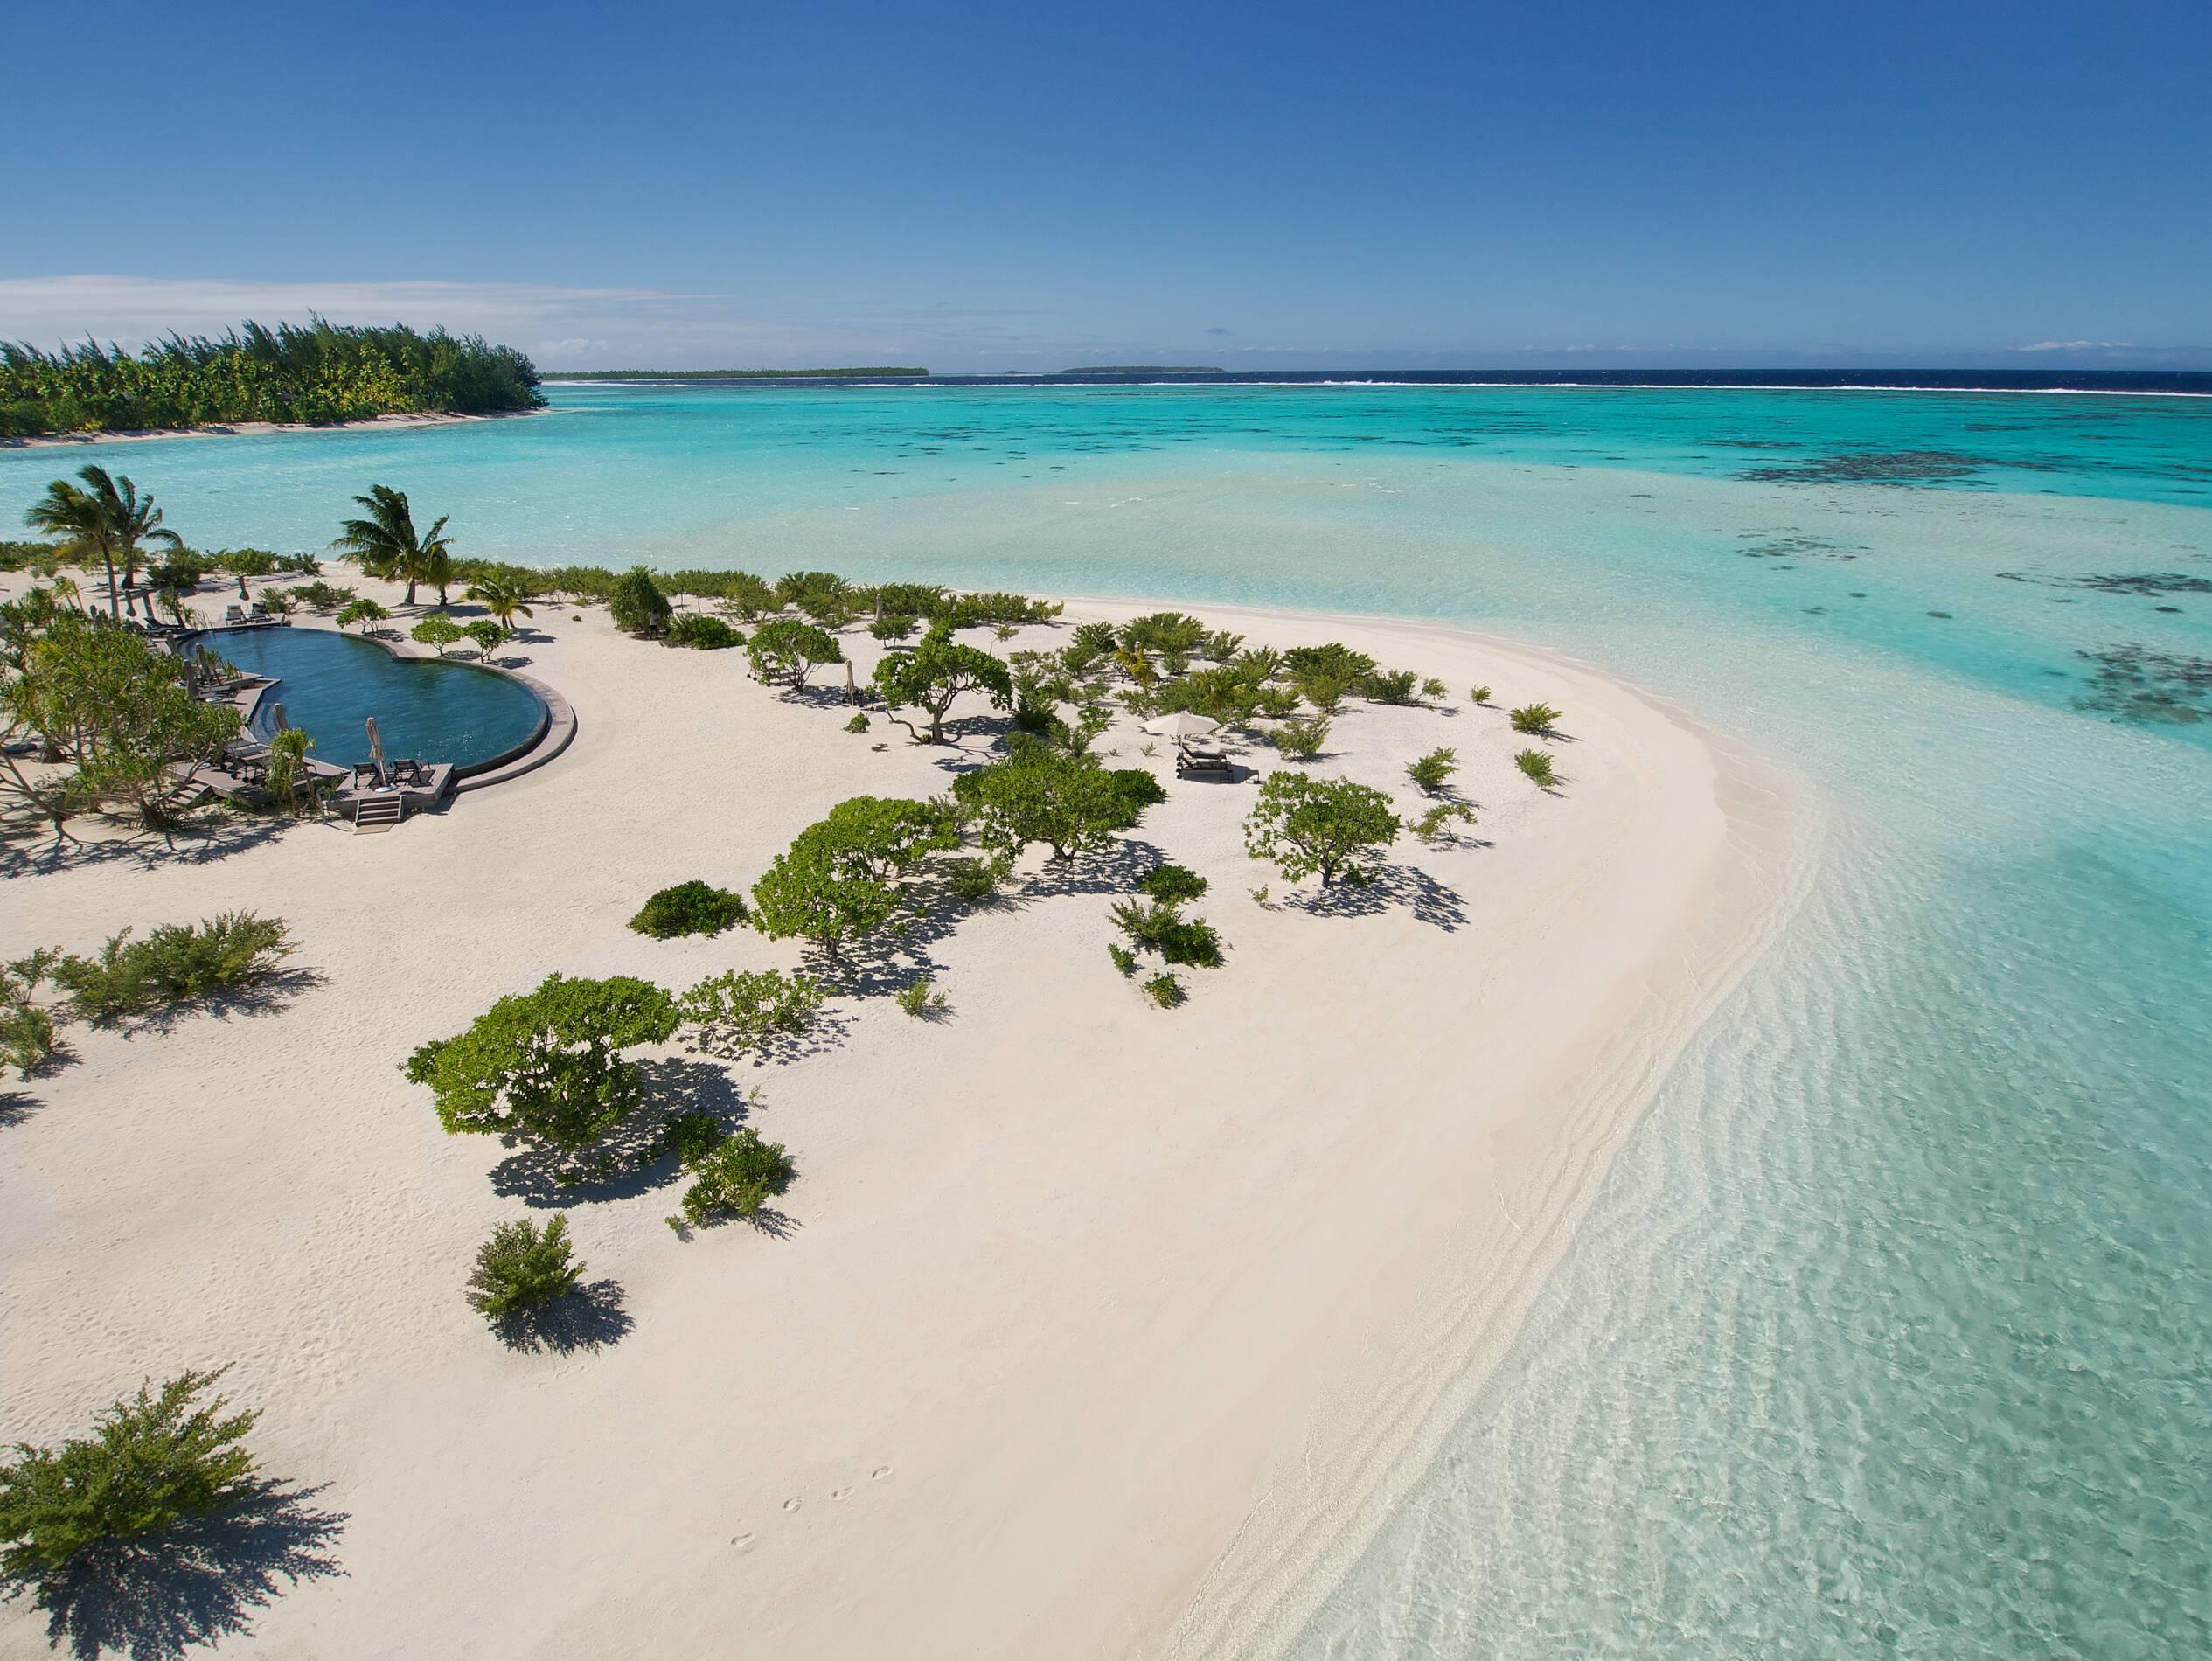 The Brando Piscine et Plage Polynesie Tetiaroa